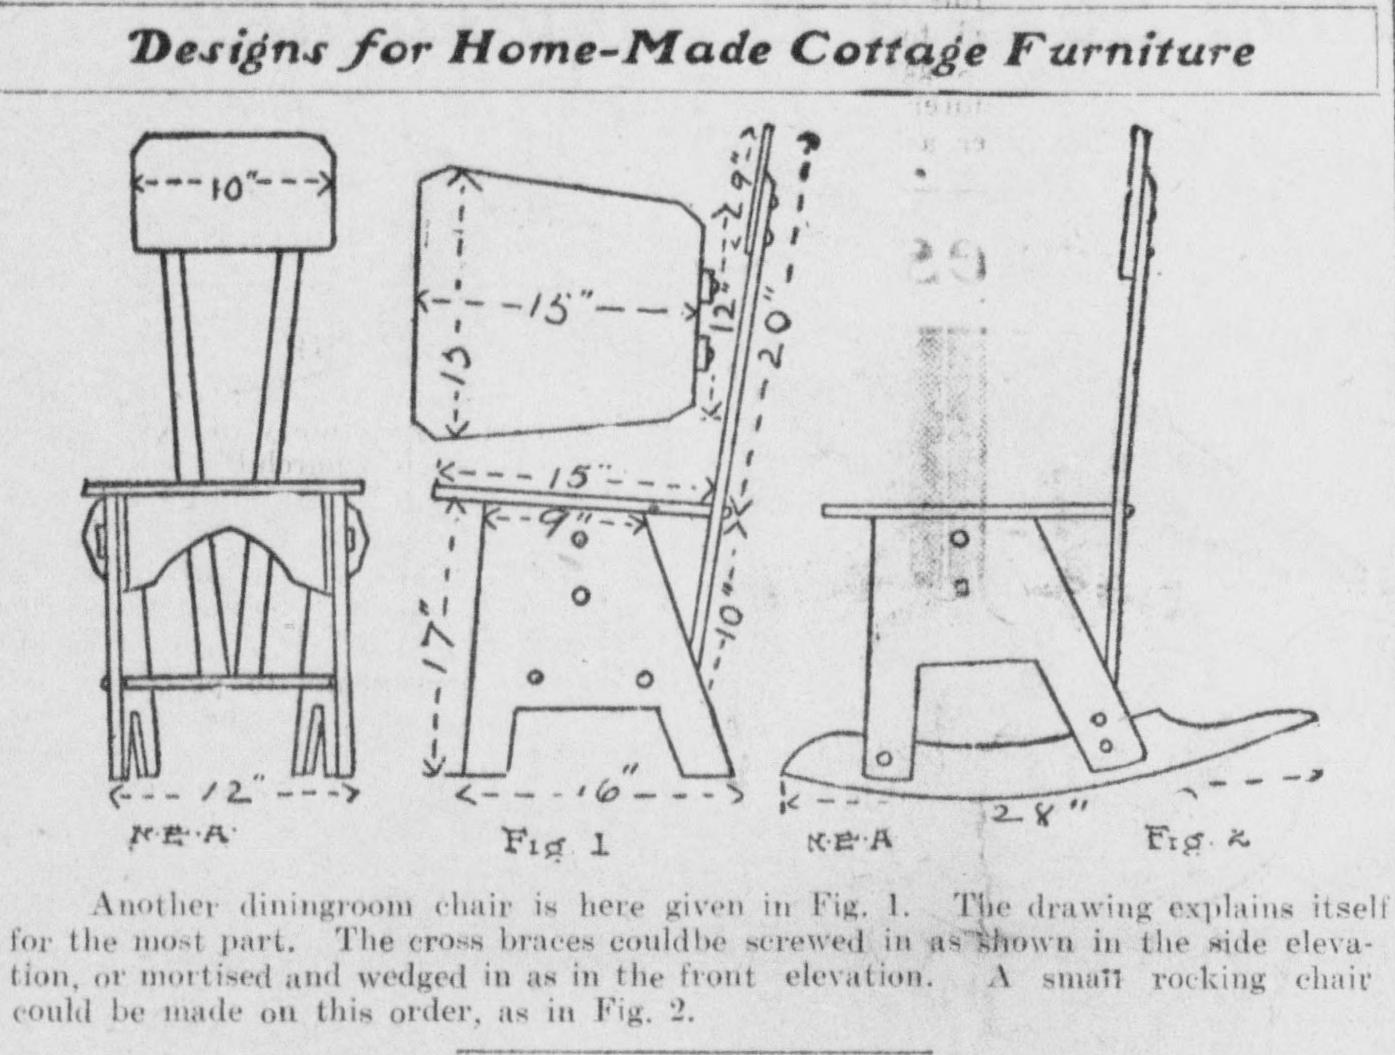 File Designs For Homemade Cottage Furniture 1904 Dining Room